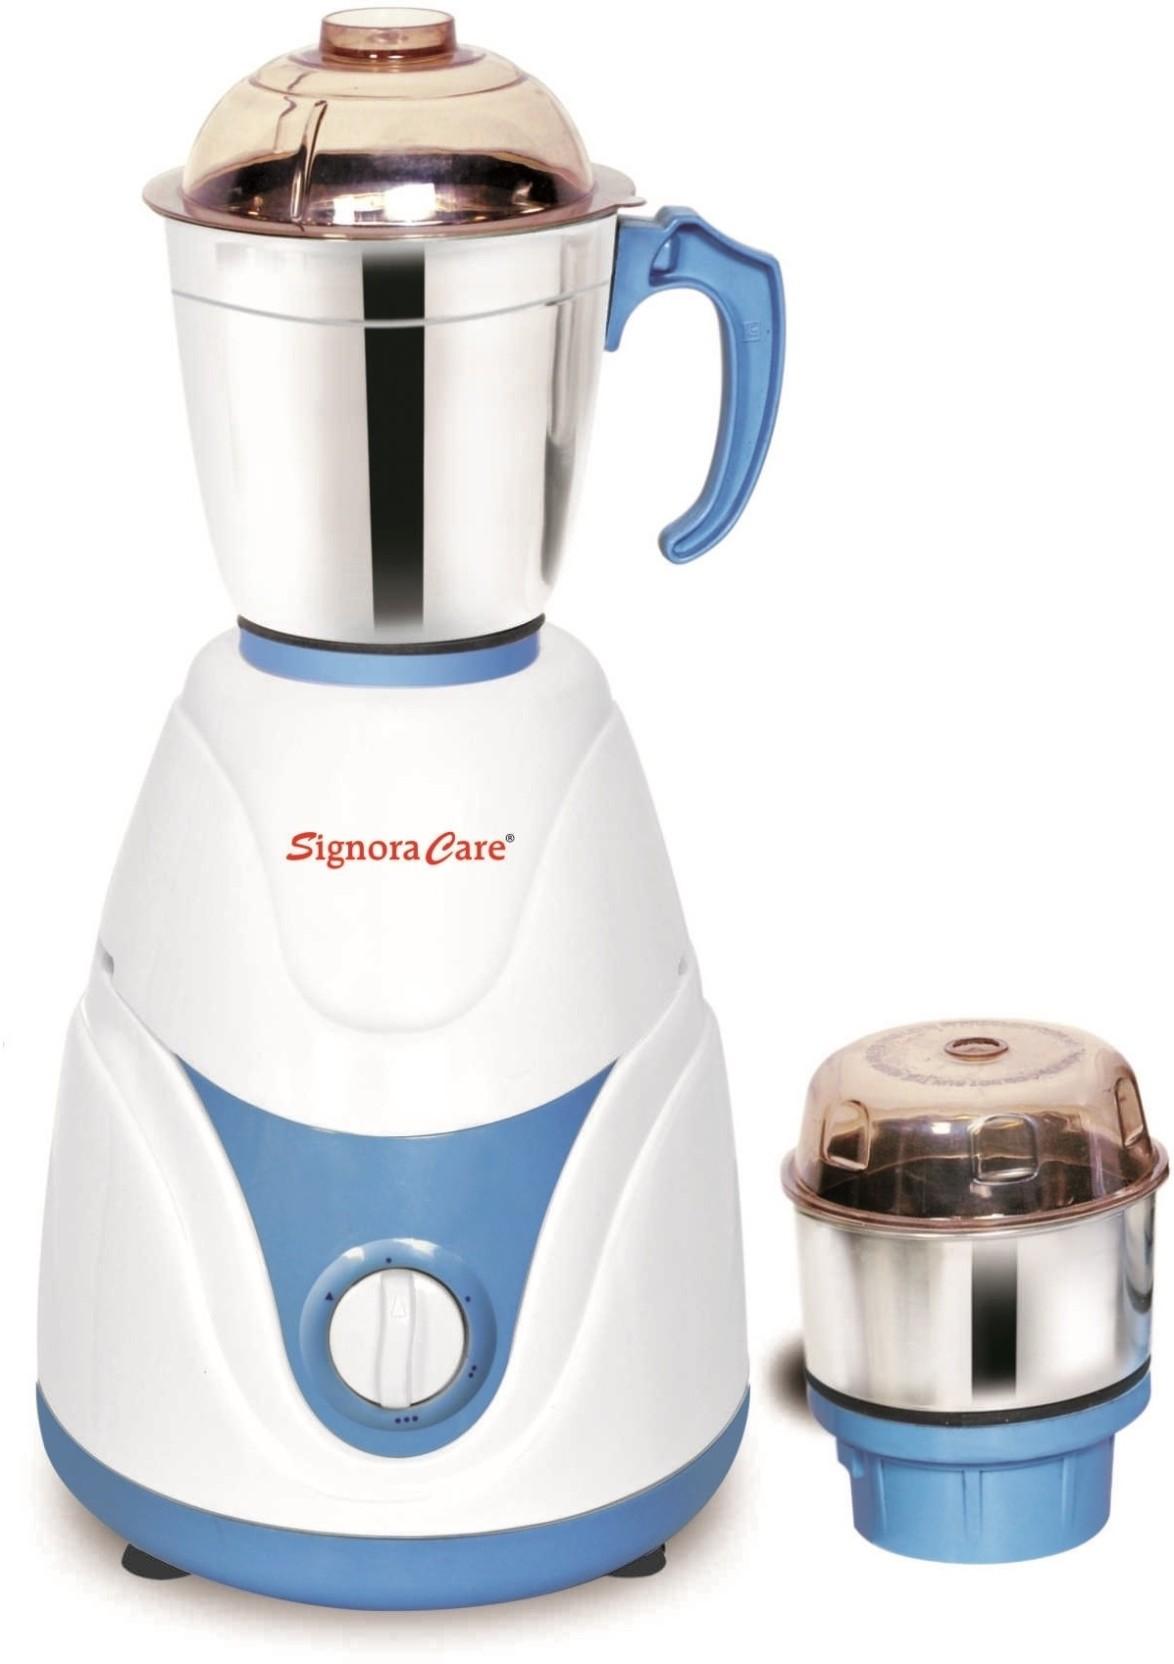 Signoracare Eco Plus 500 W Mixer Grinder Price In India Buy Signora Snack Maker Home